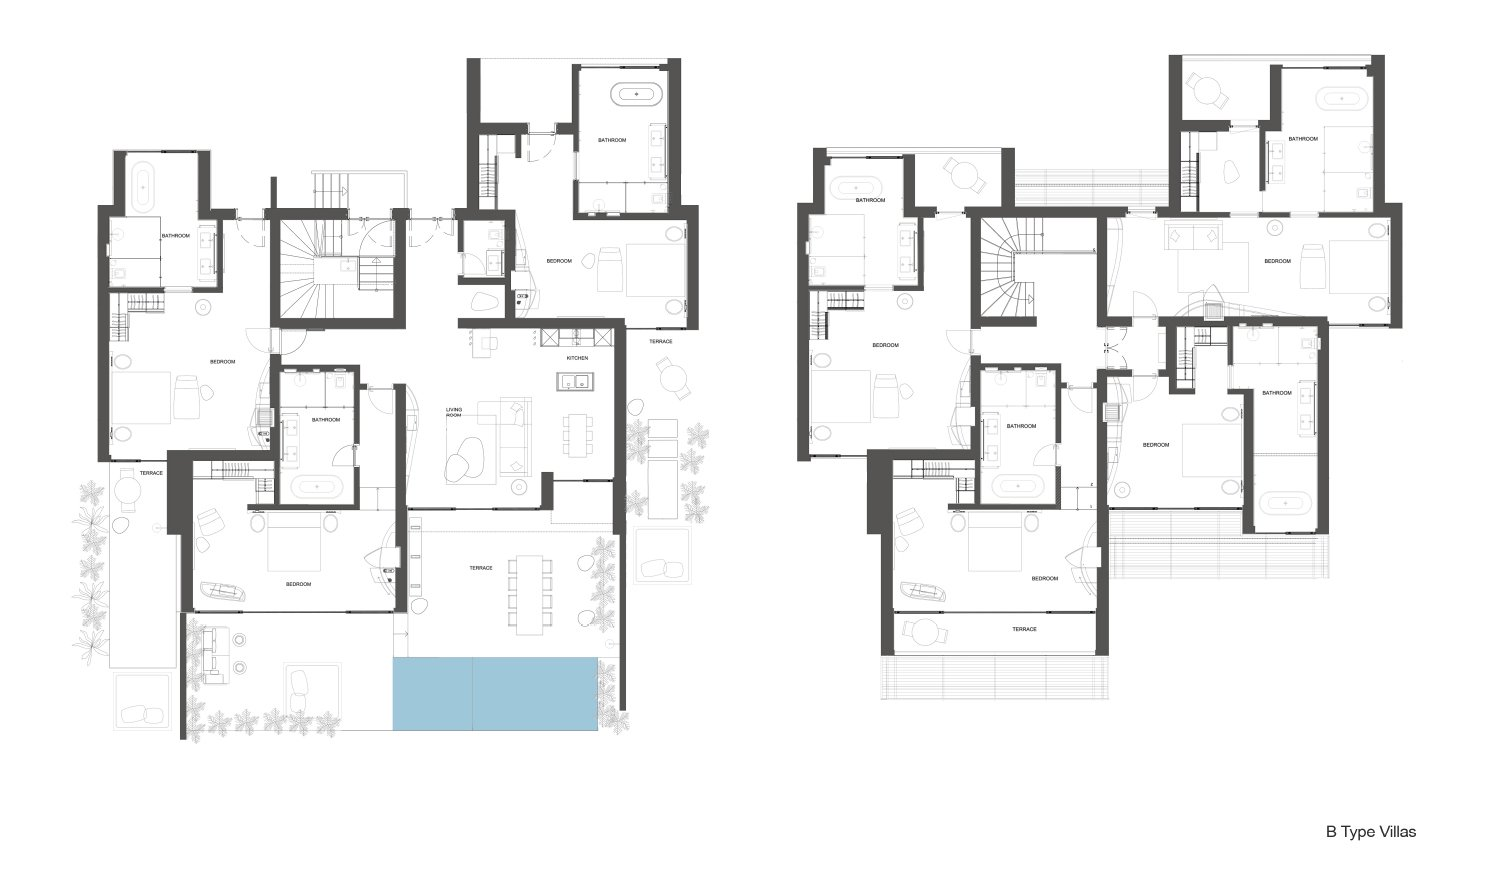 B type villas }